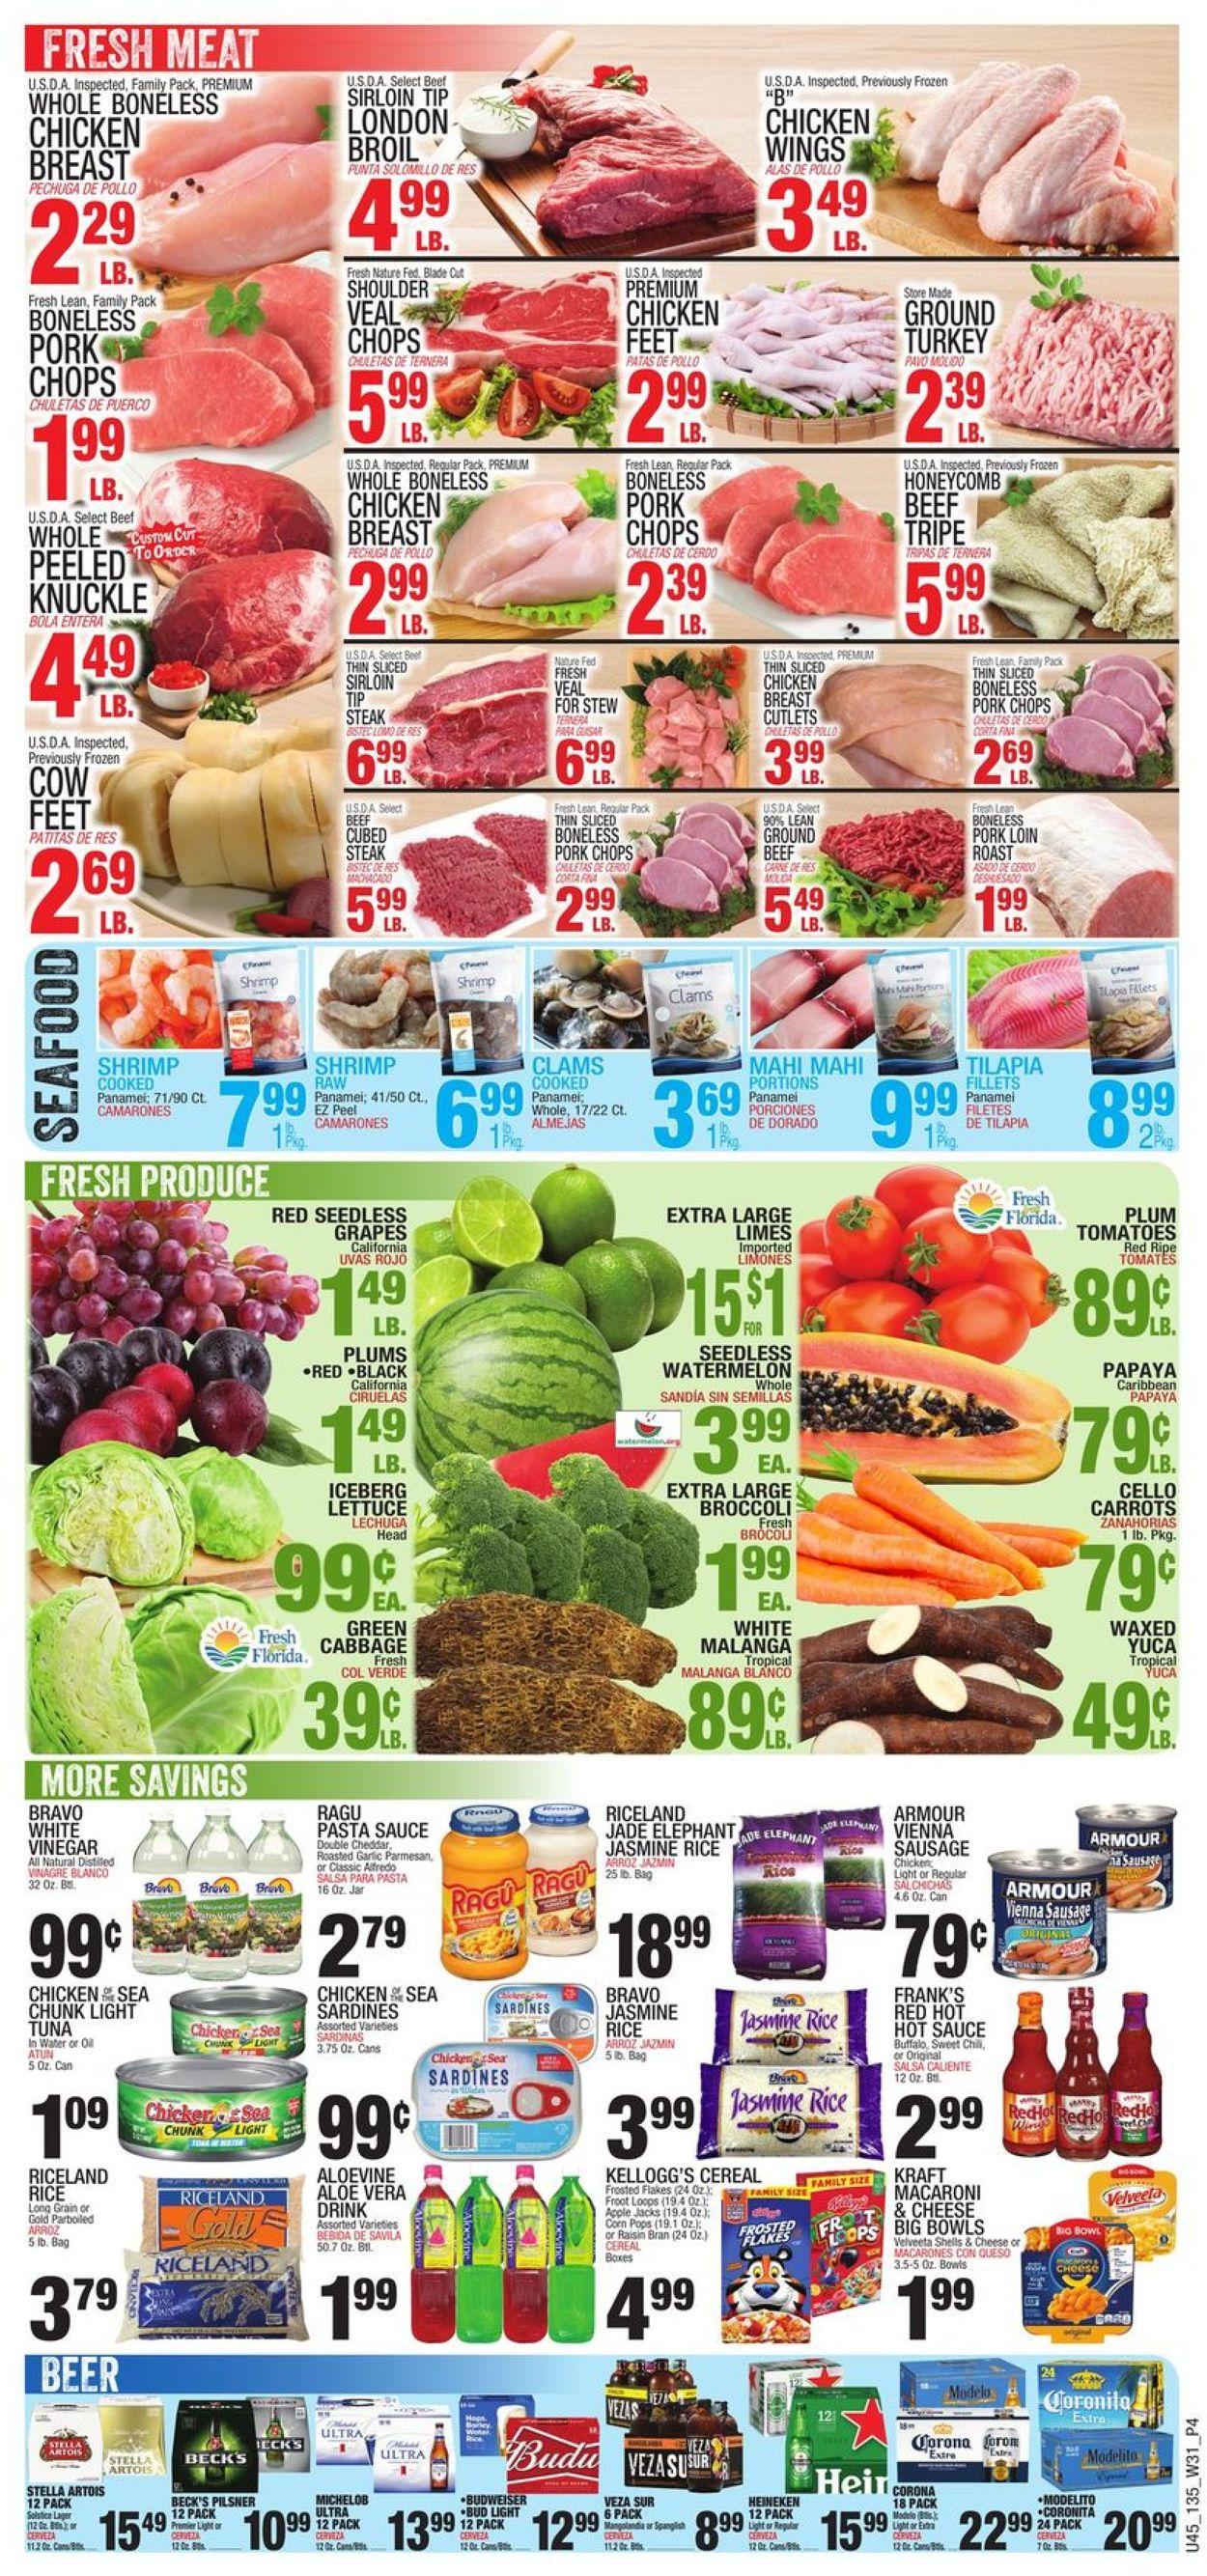 Bravo Supermarkets Weekly Ad Circular - valid 07/29-08/04/2021 (Page 4)